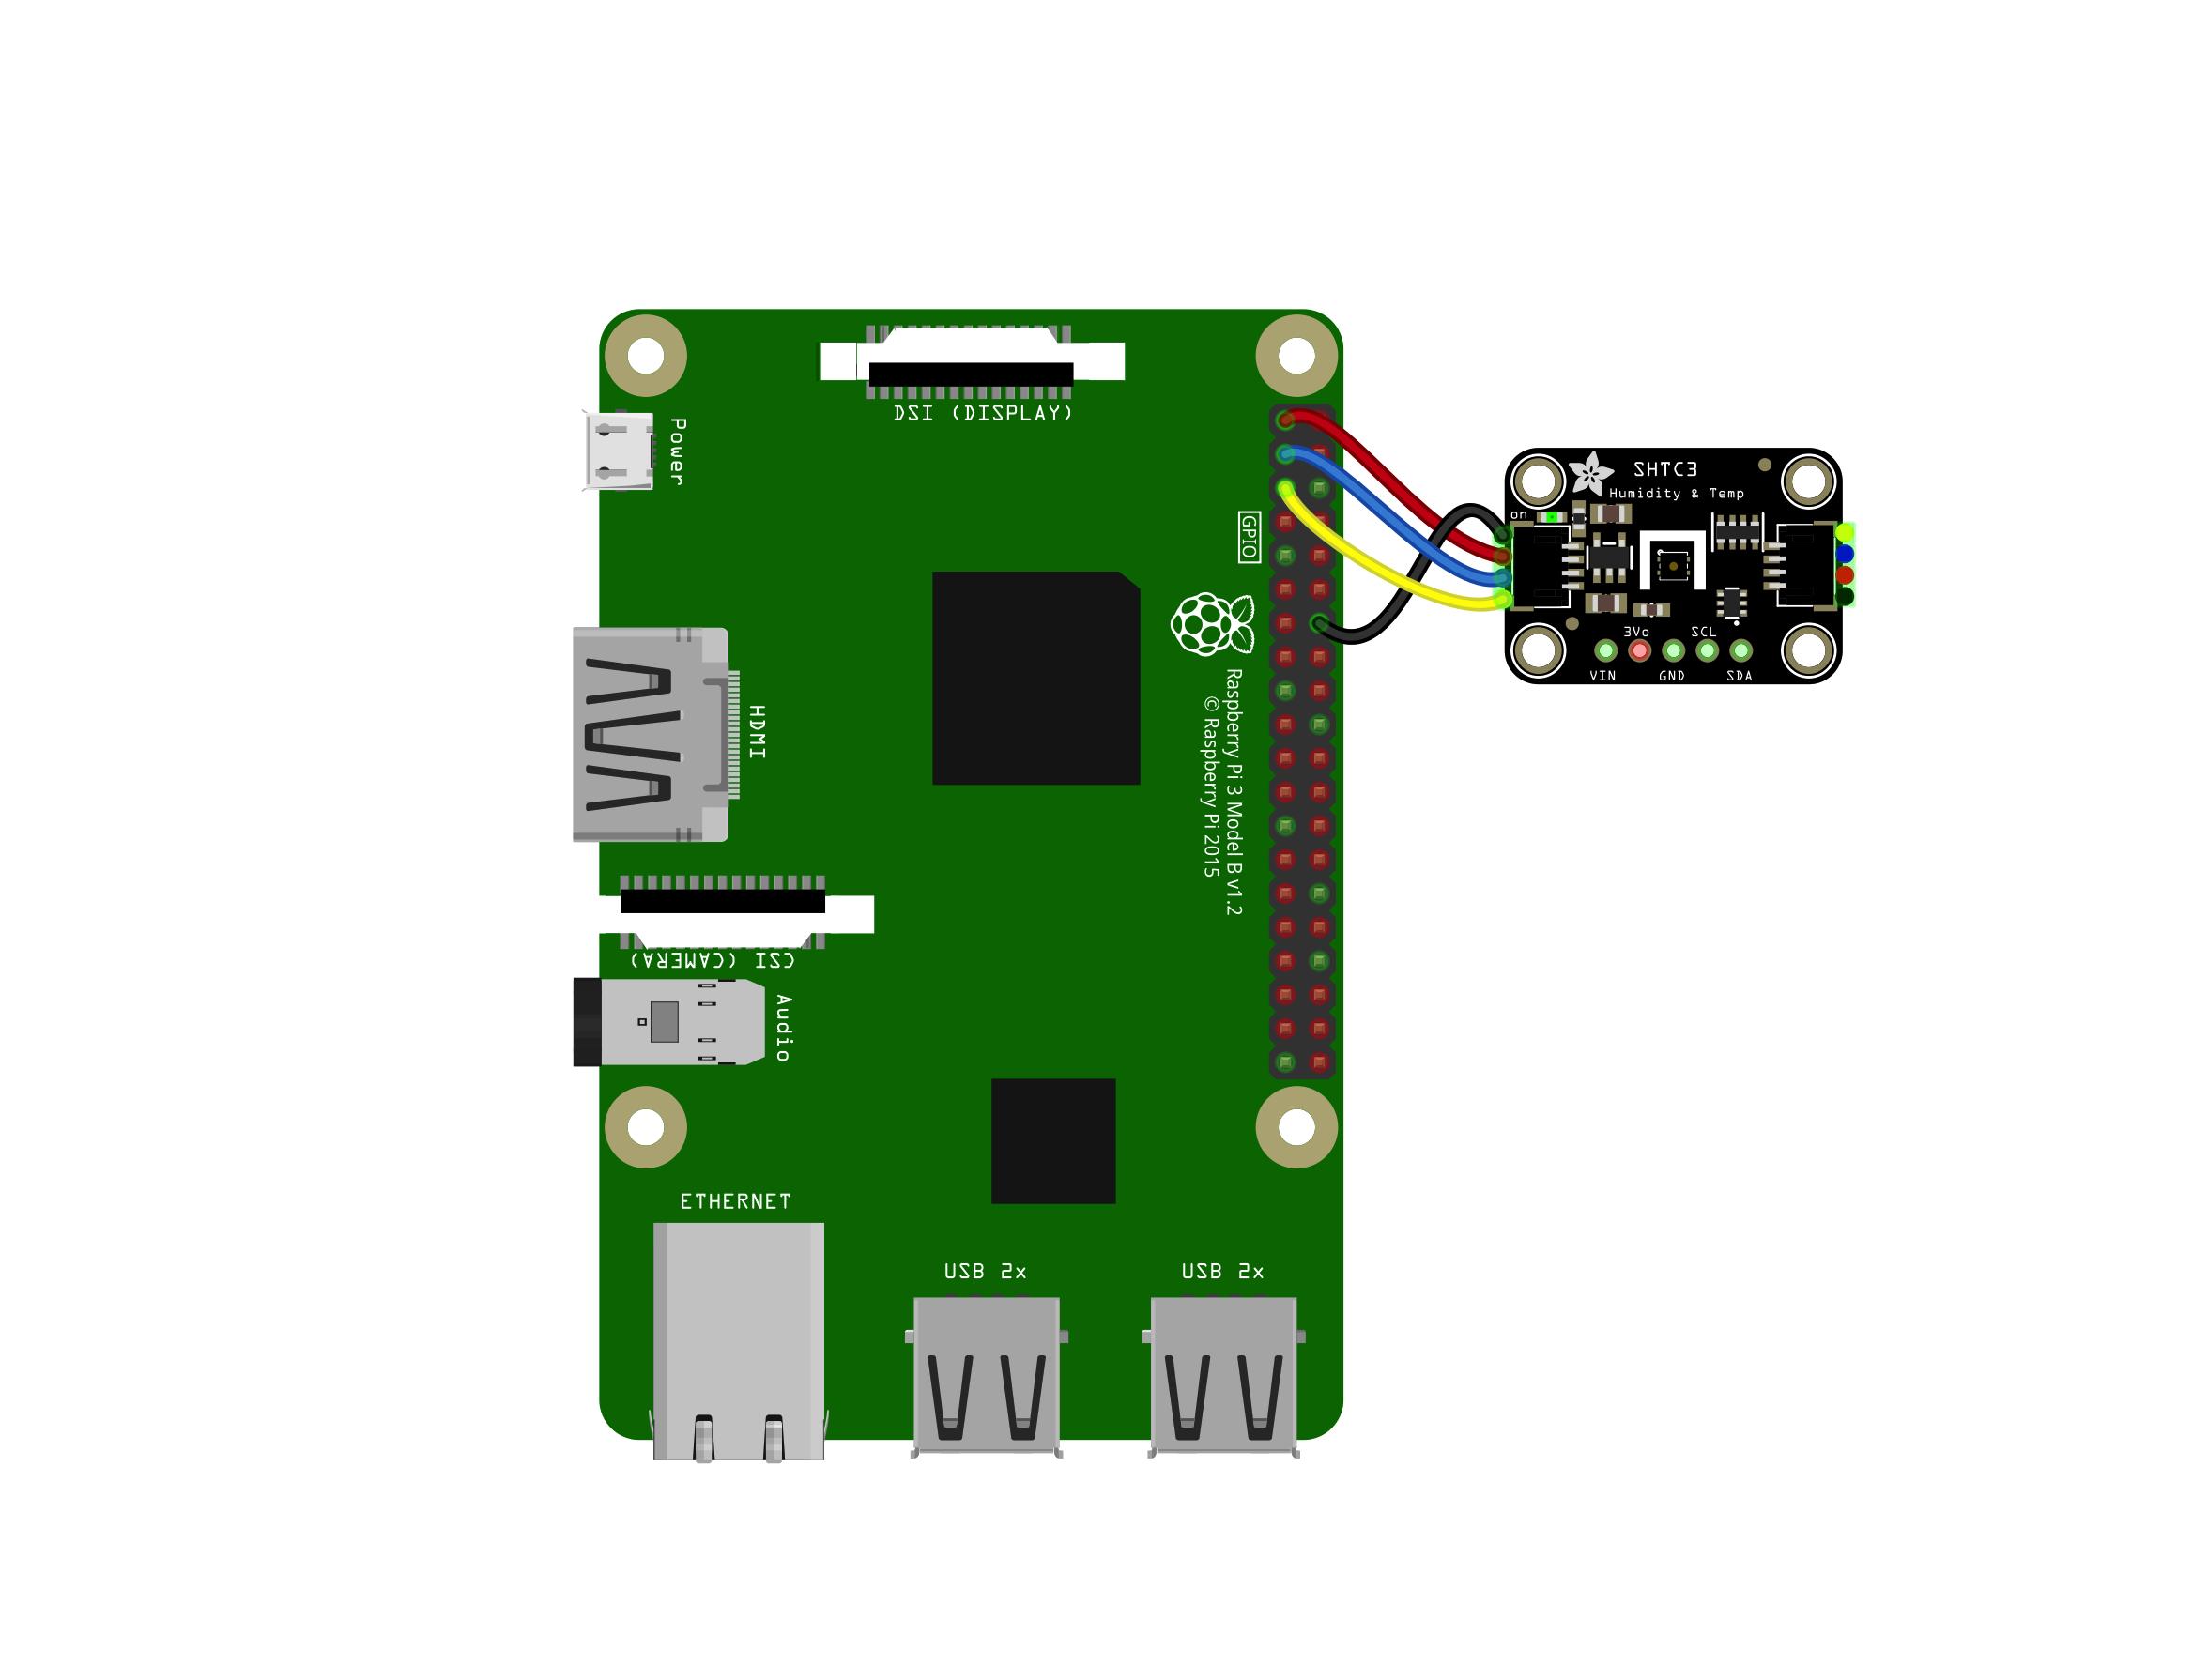 adafruit_products_d_rpi_wiring_a_qt.png